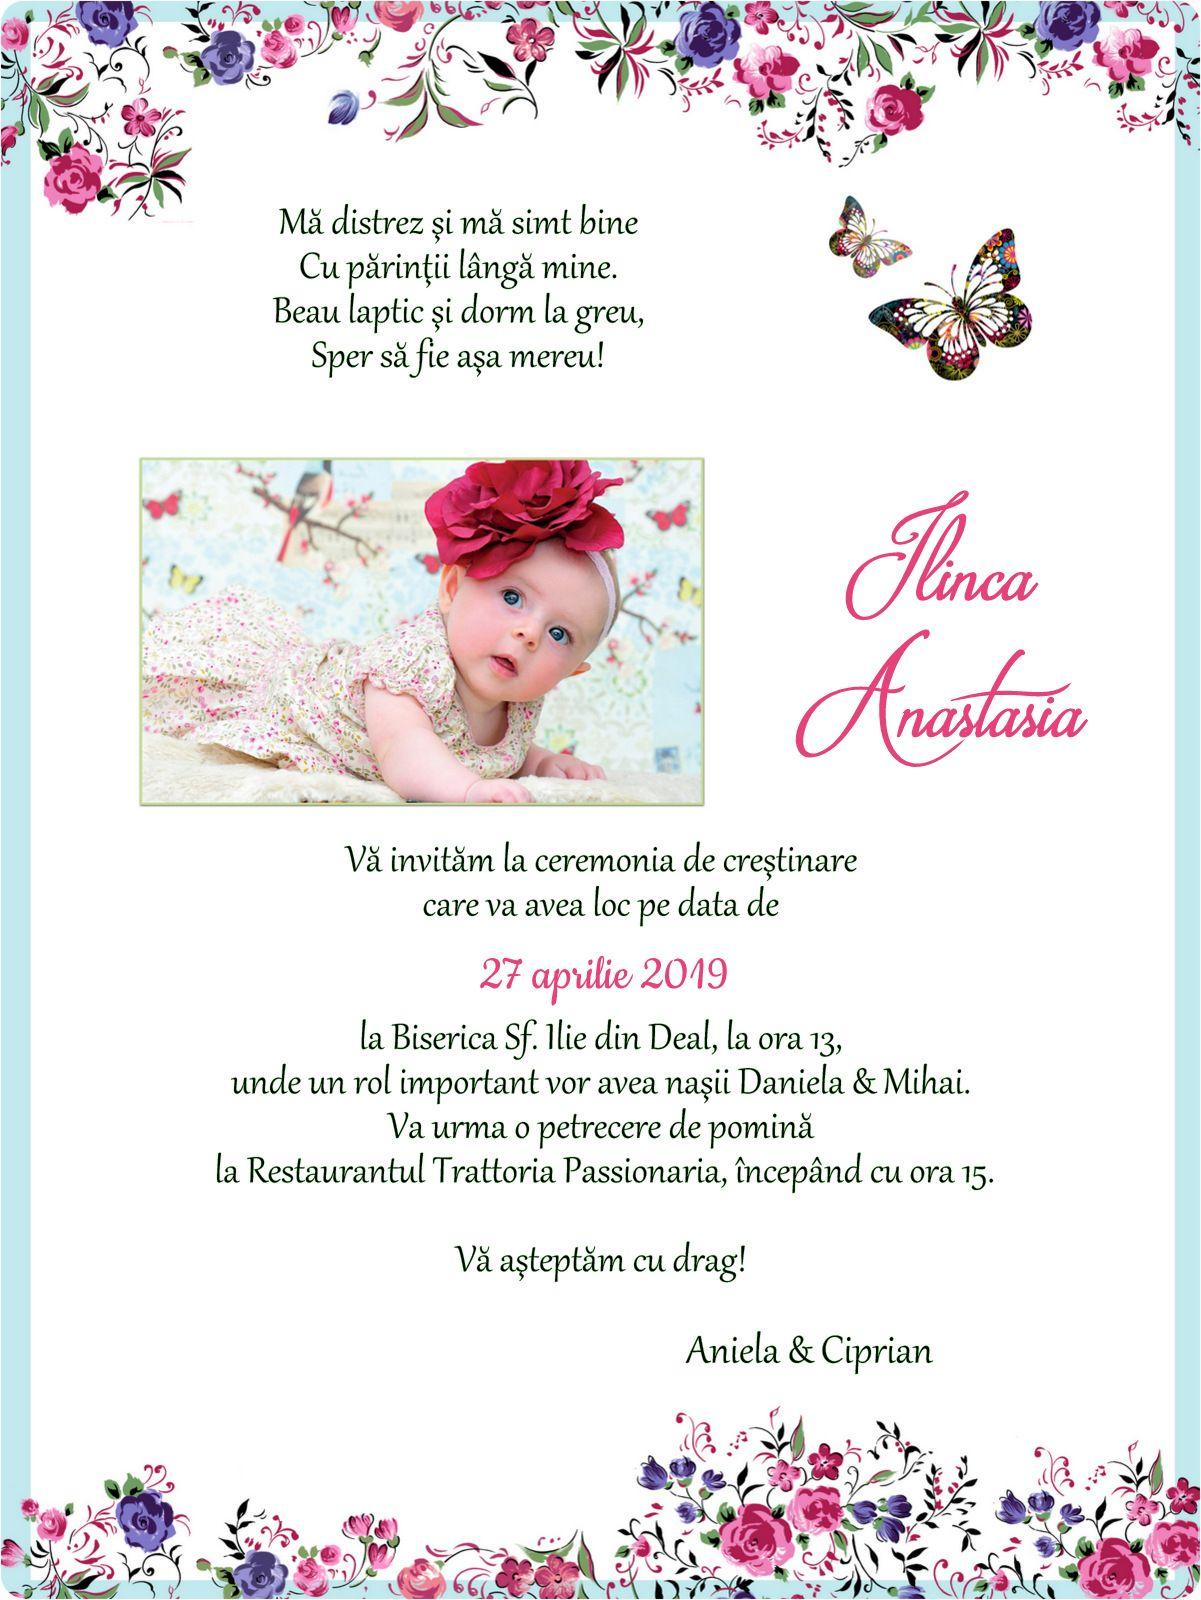 Invitatii De Botez De Trimis Online E Mail Facebook Whatsapp